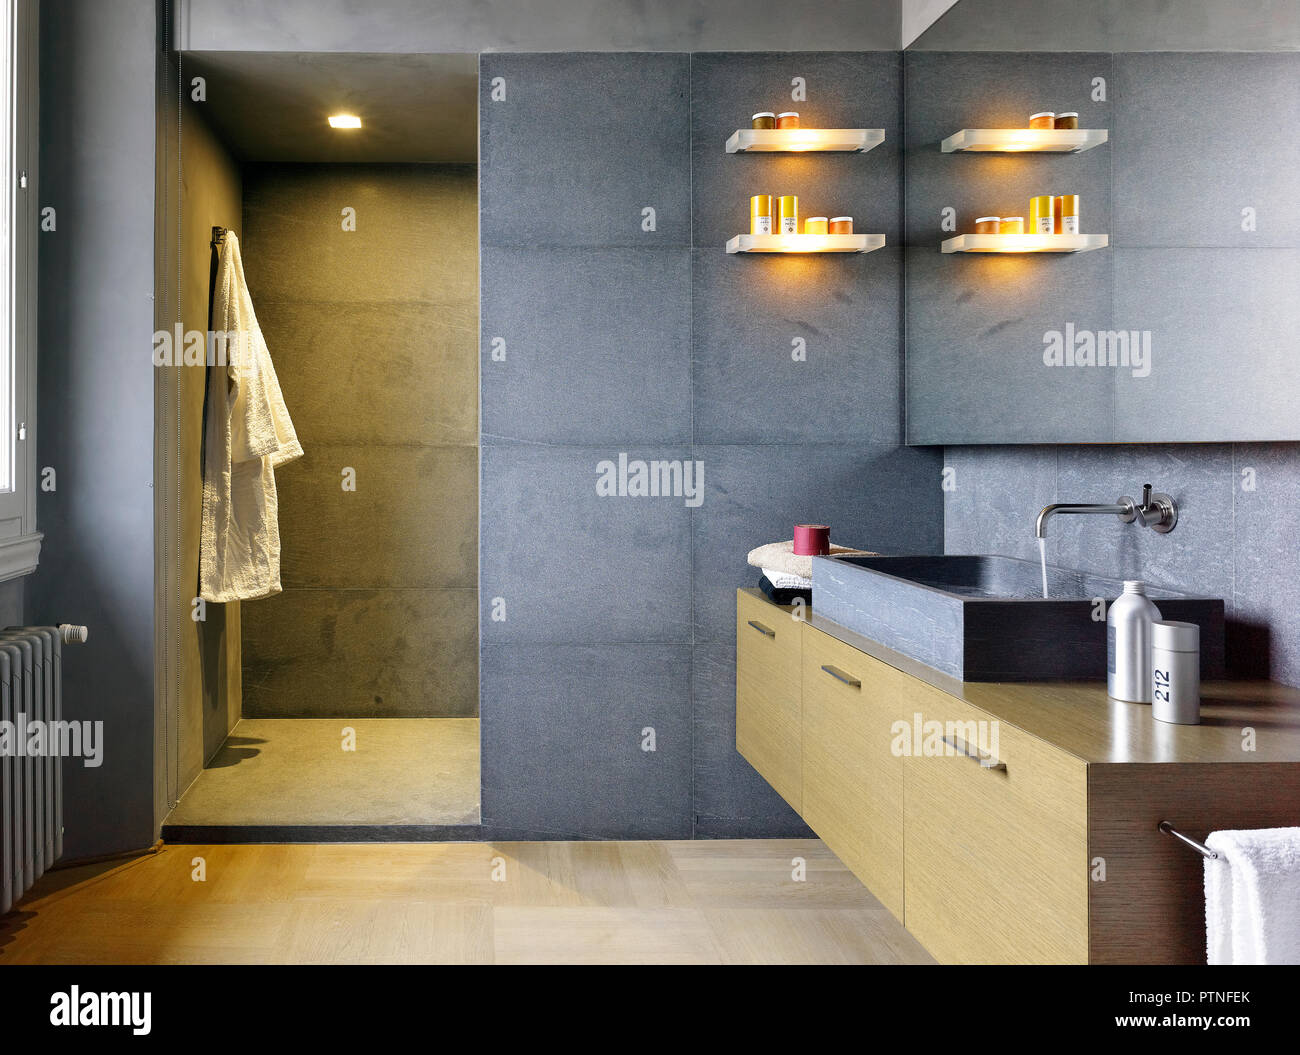 Elegant Bathroom In Italian Apartment Stock Photo Alamy